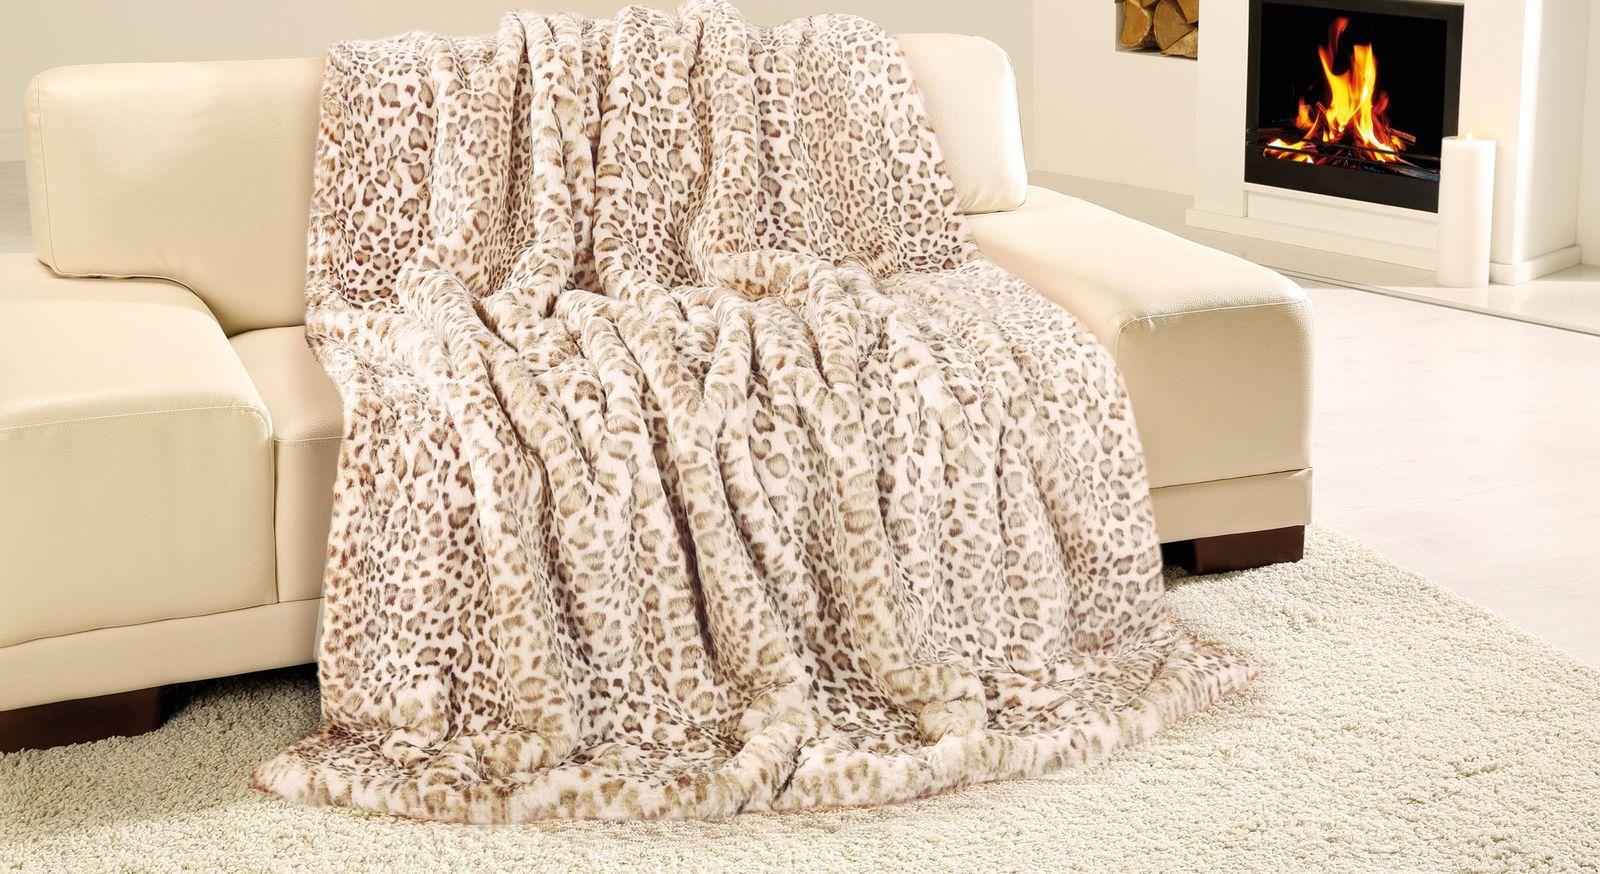 Robuste Felldecke Gepard aus synthetischer Faser